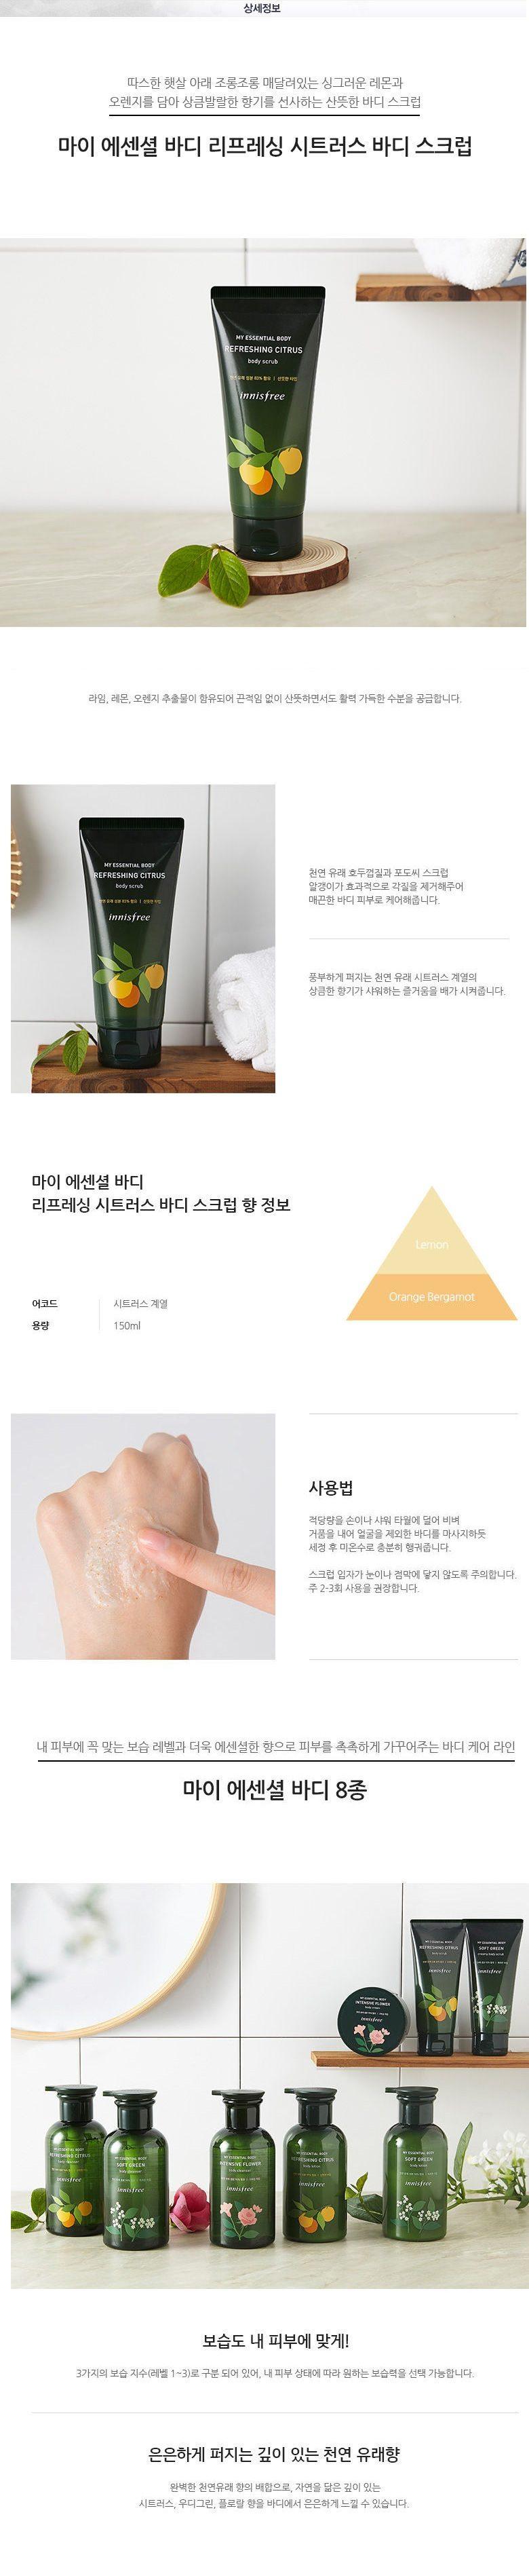 Innisfree My Essential Body Refreshing Citrus Body Scrub korean cosmetic skincare product online shop malaysia usa mexico1